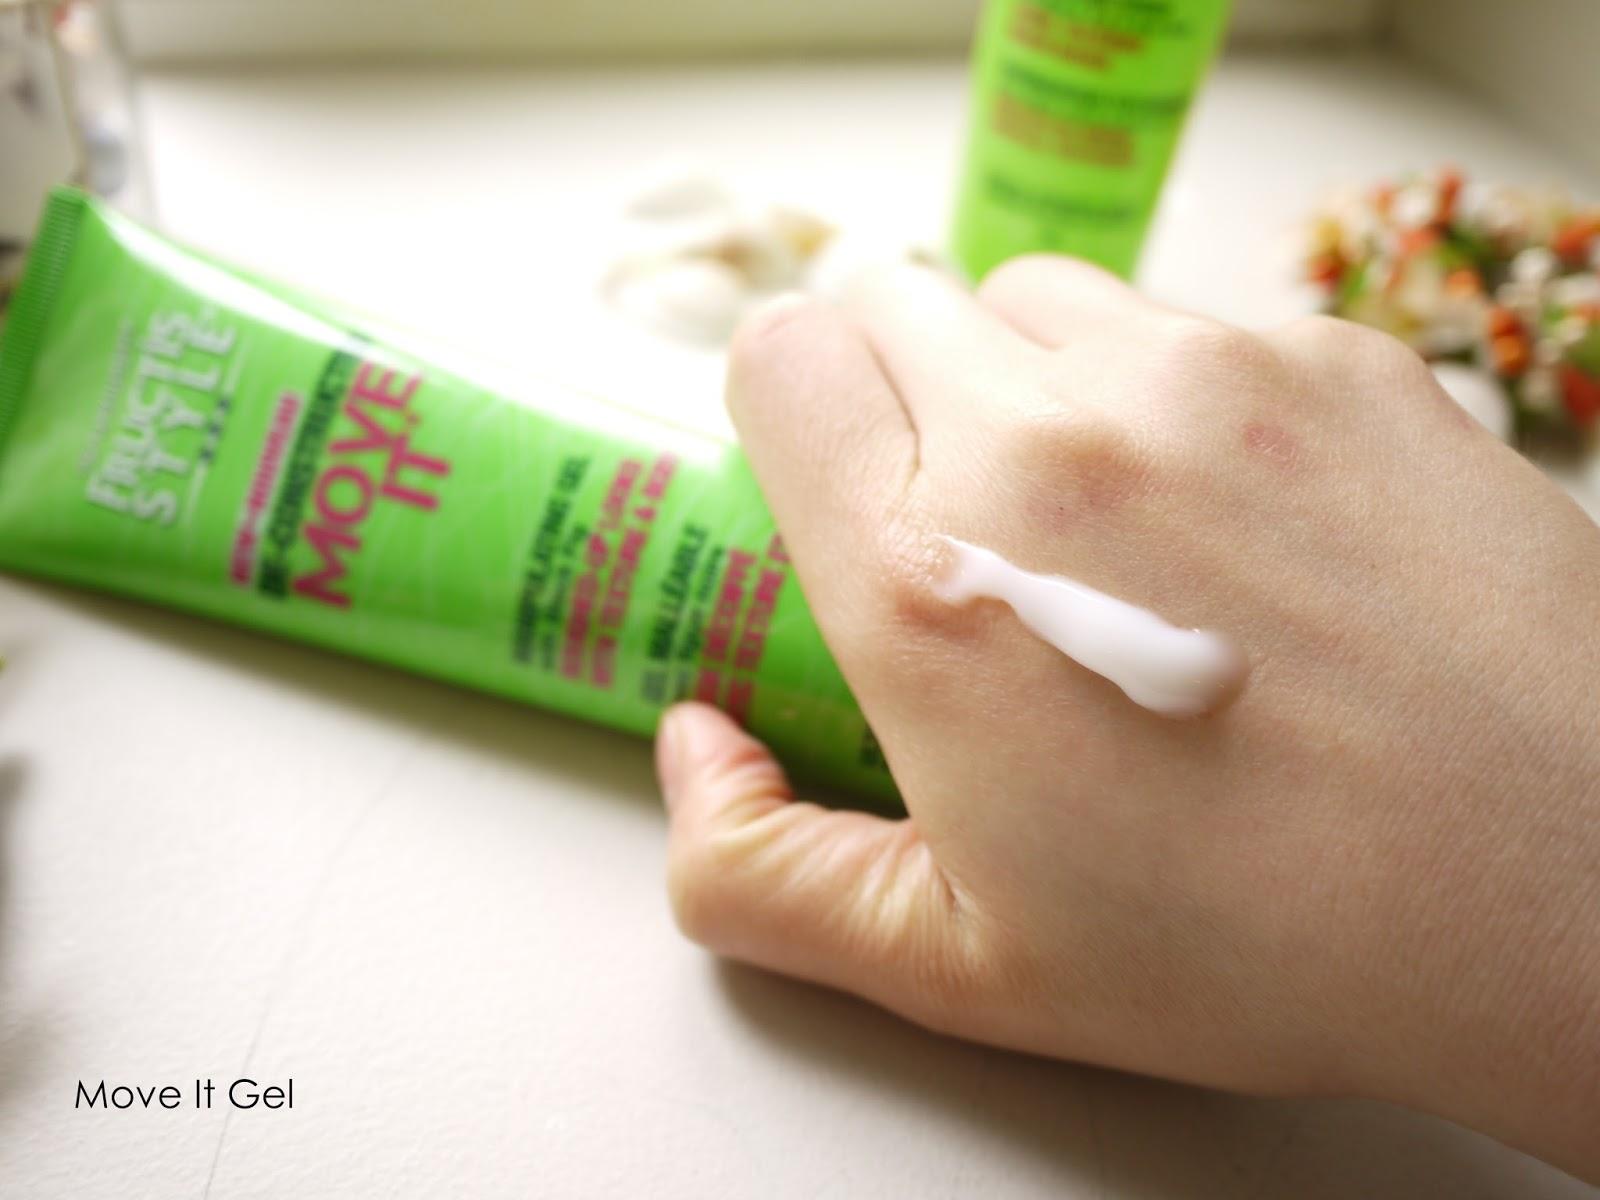 garnier deconstructed beach chic hair spray pixie play creme move it gel review